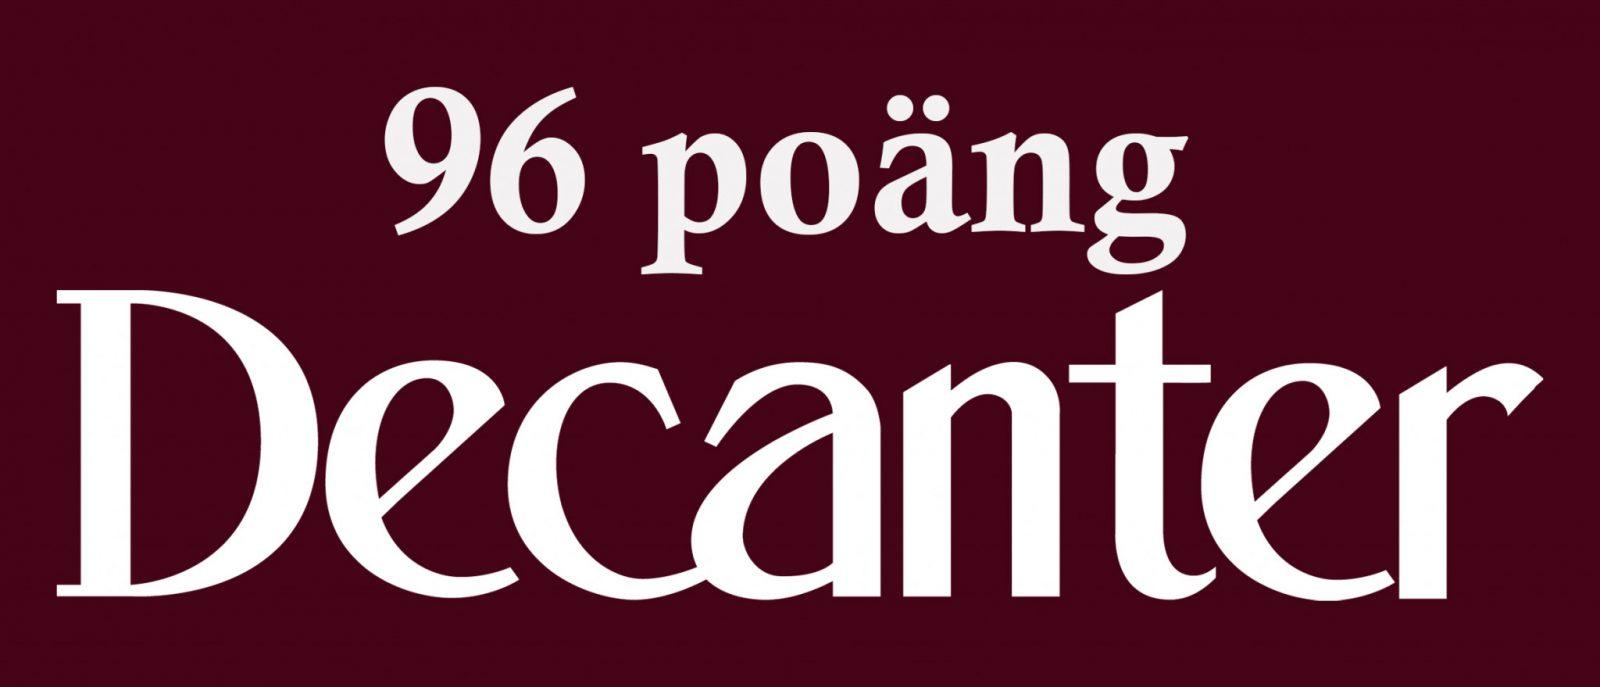 Decanter_96 p